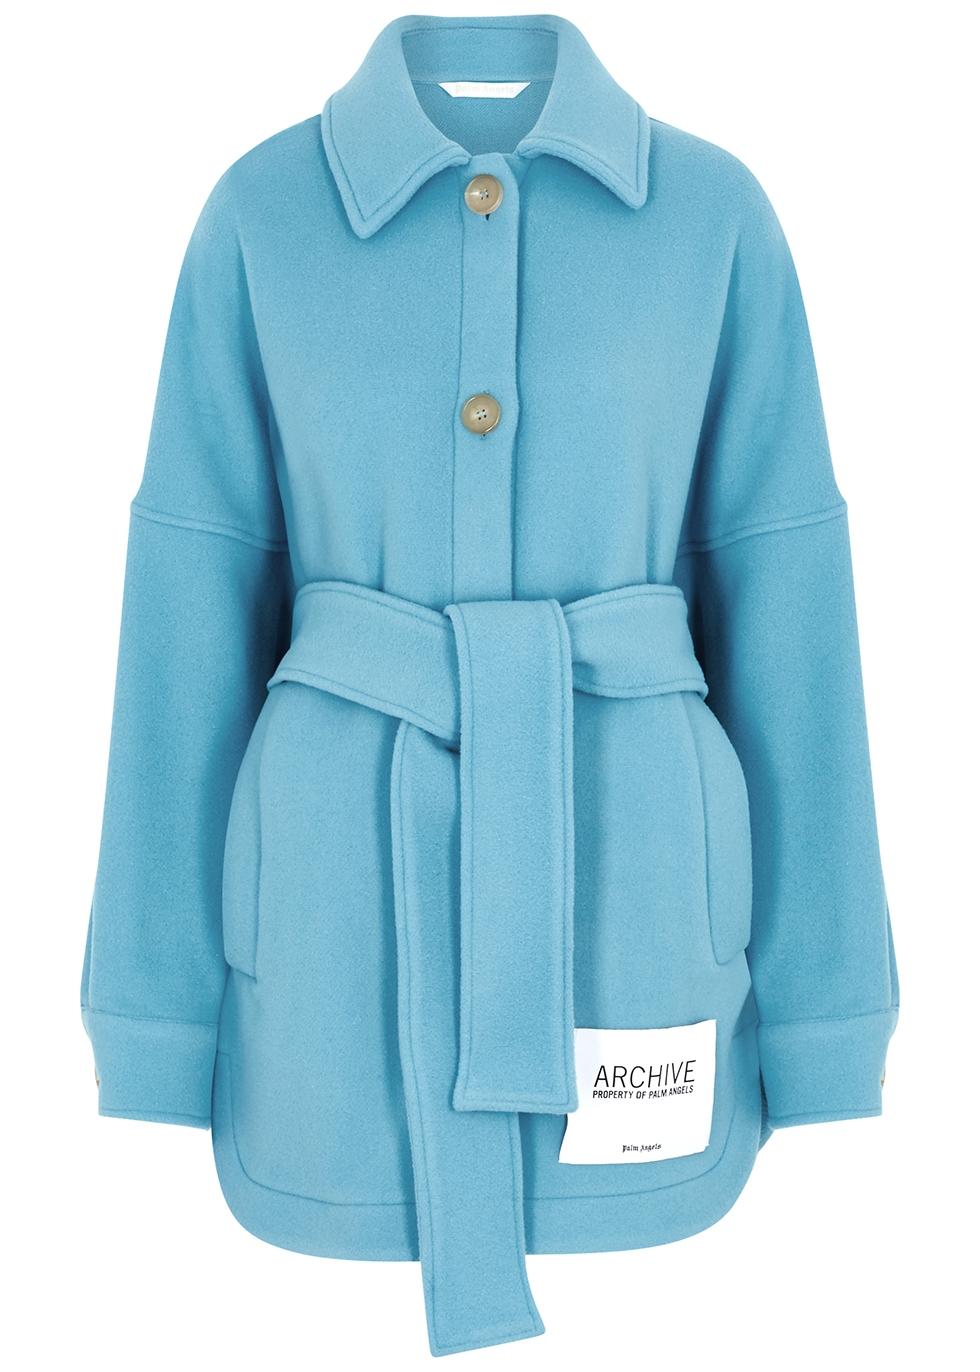 Archive wool-blend jacket